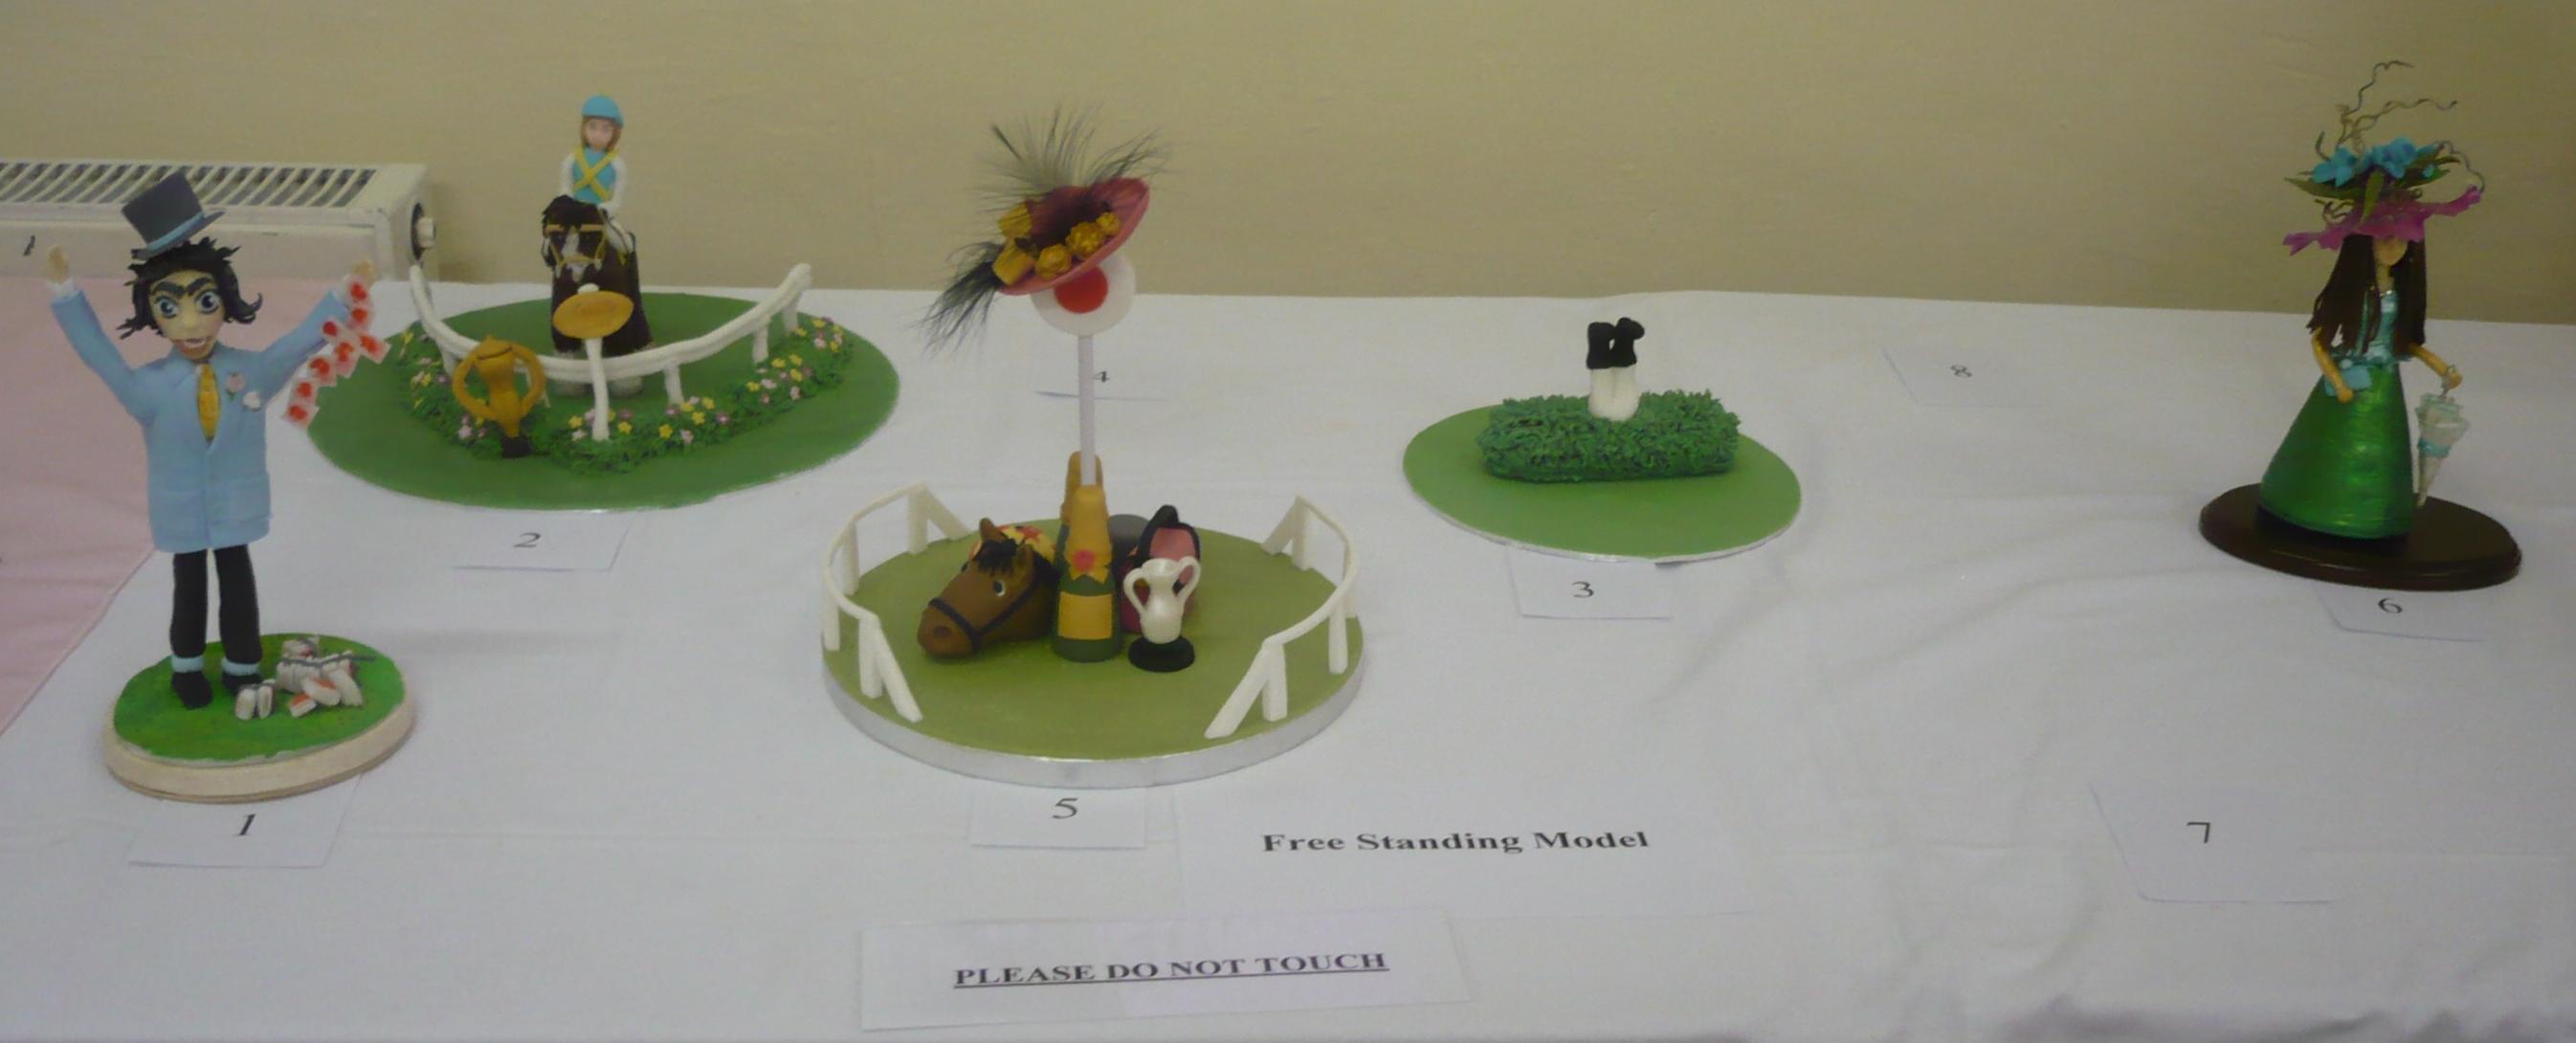 Our freestanding Model entries.JPG